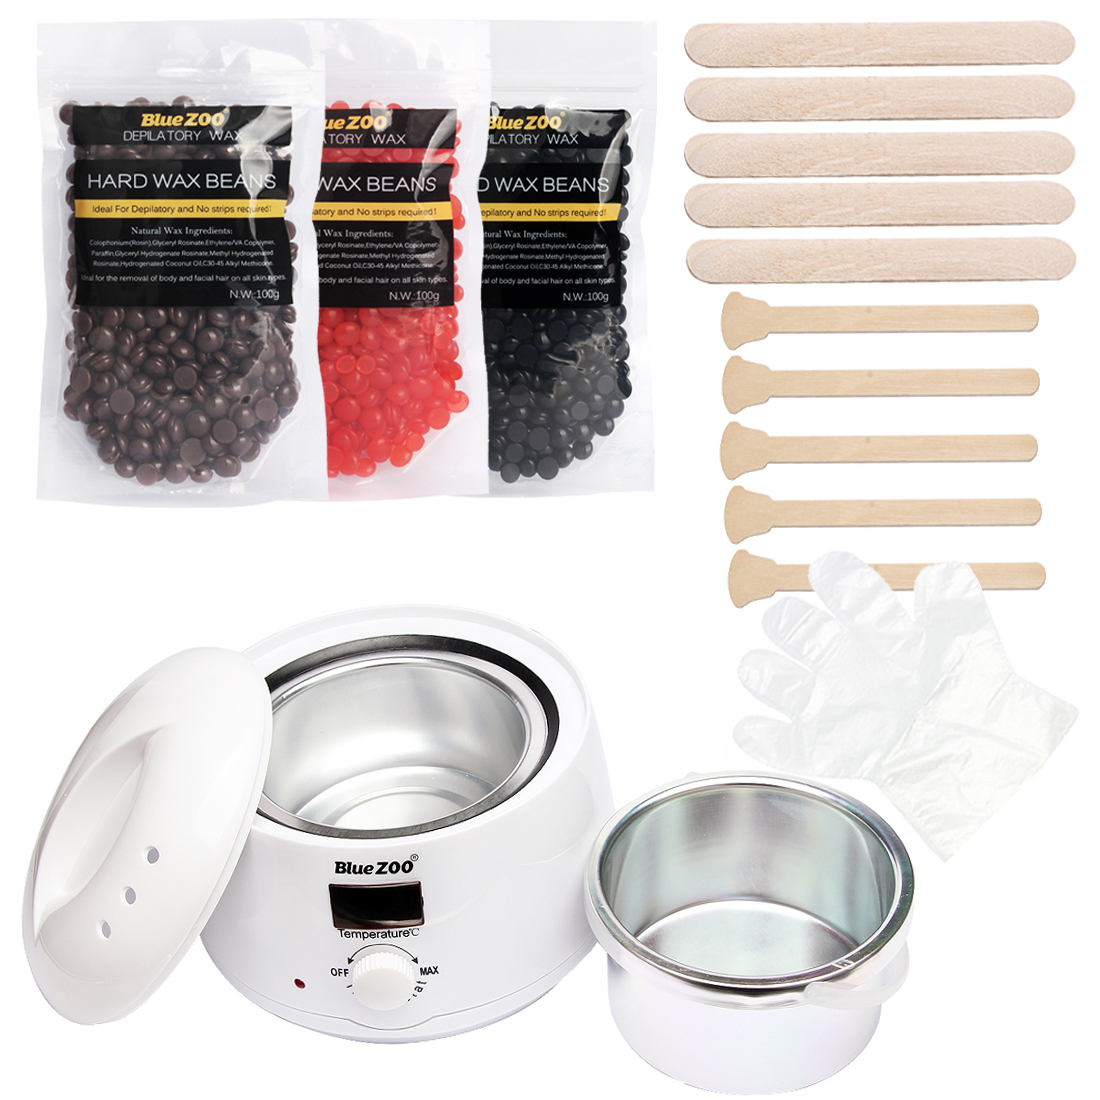 Beauty Salon Depilatory Wax Heater Kit Body Hair Removal Set Wax Heater Machine+ 3 Bag Wax Beans + 10 Wood Spatulas + 10 Gloves